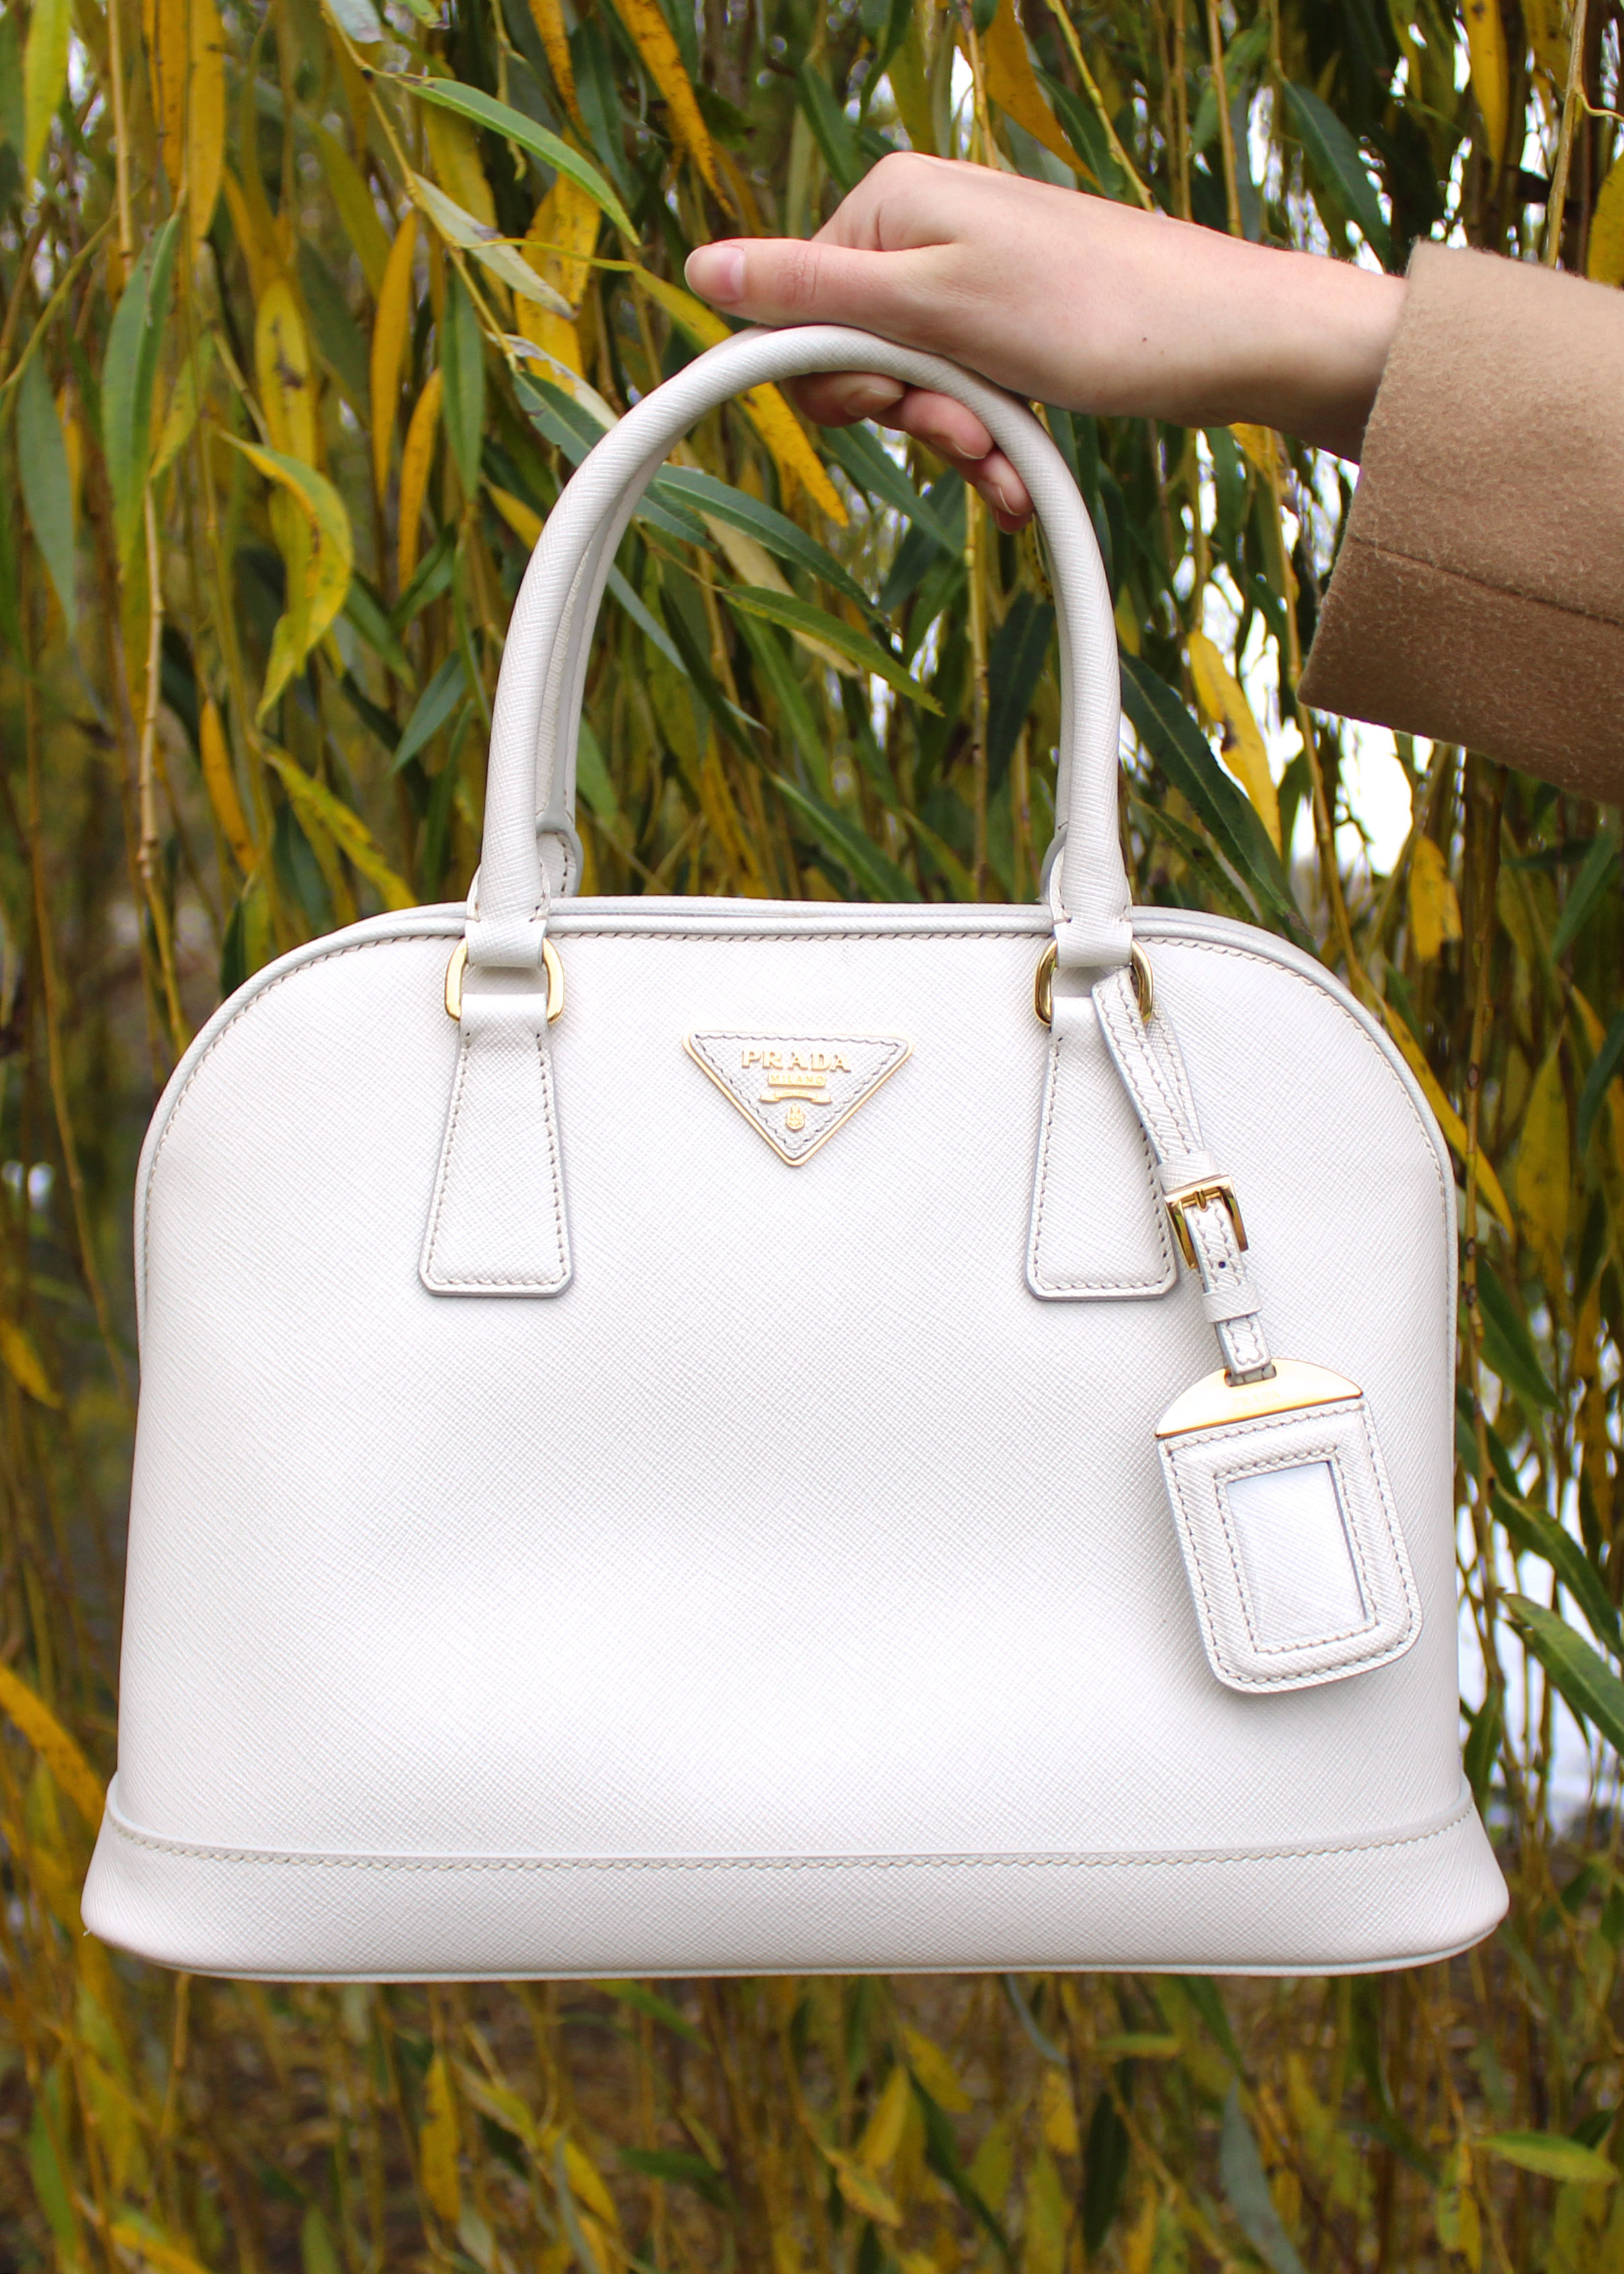 White Prada saffiano leather bag.